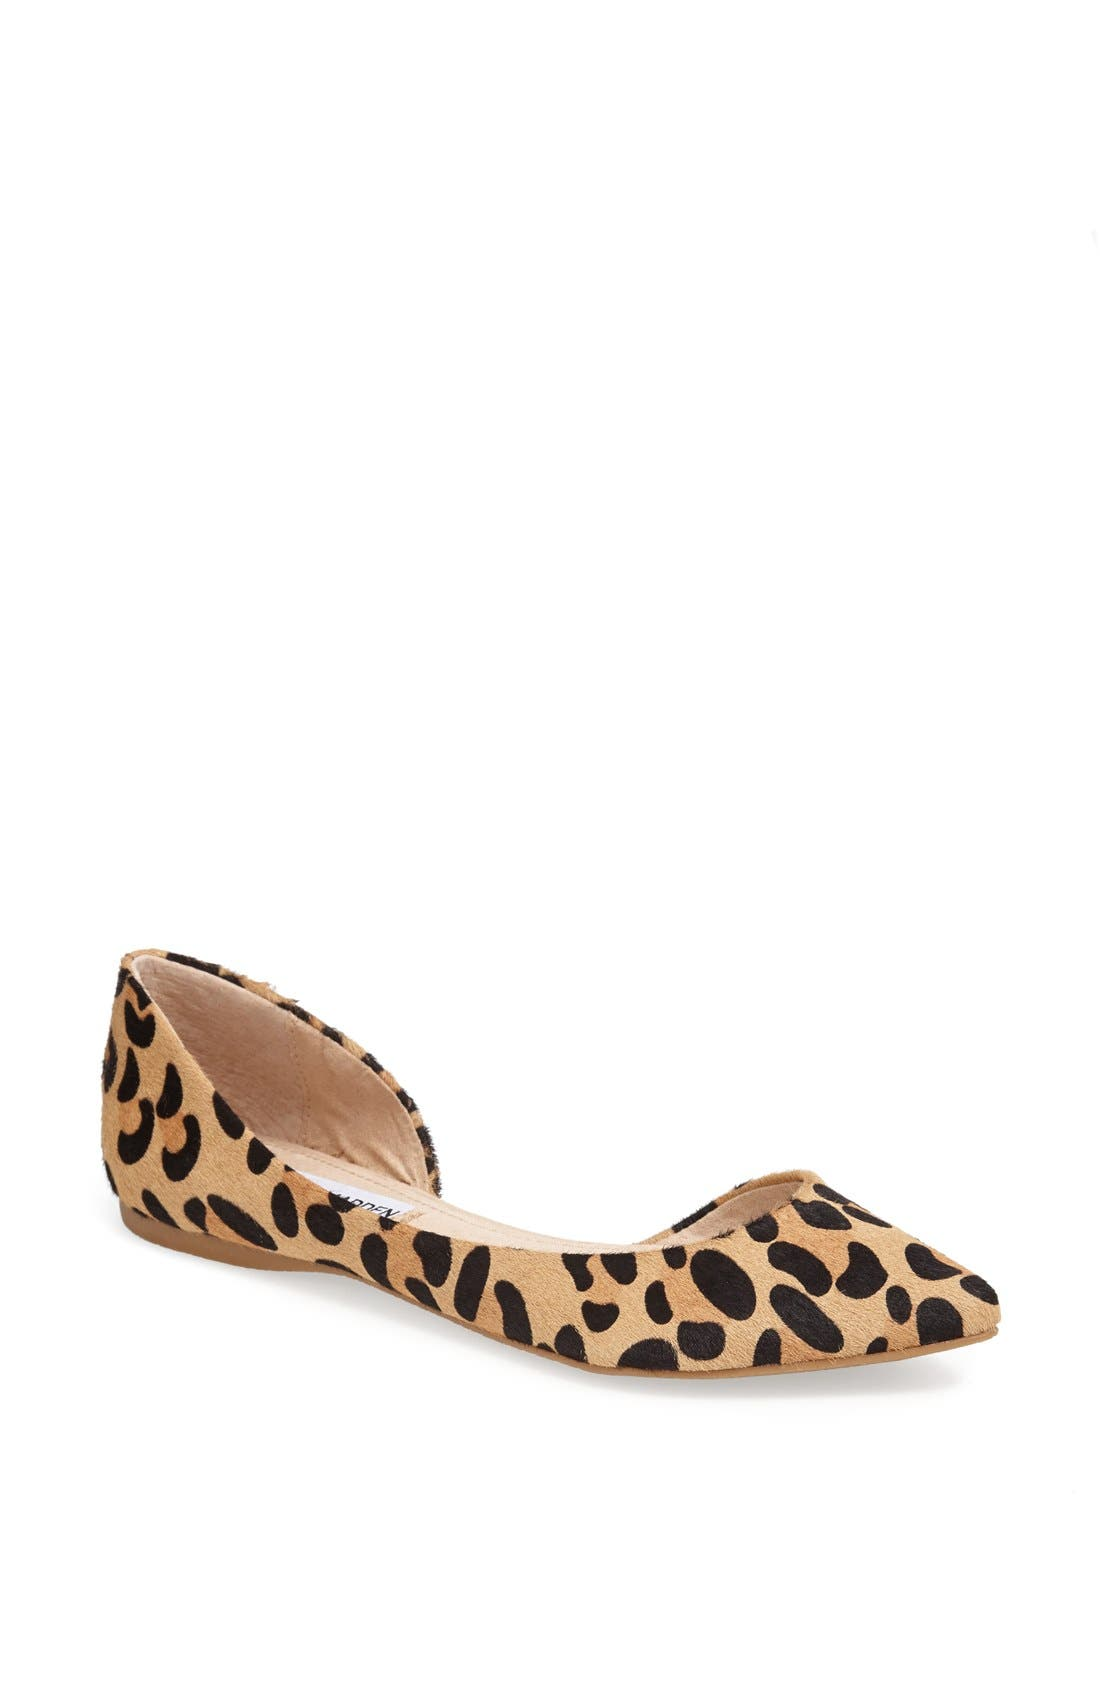 Main Image - Steve Madden 'Elusion' Leopard Print Calf Hair Half d'Orsay Flat